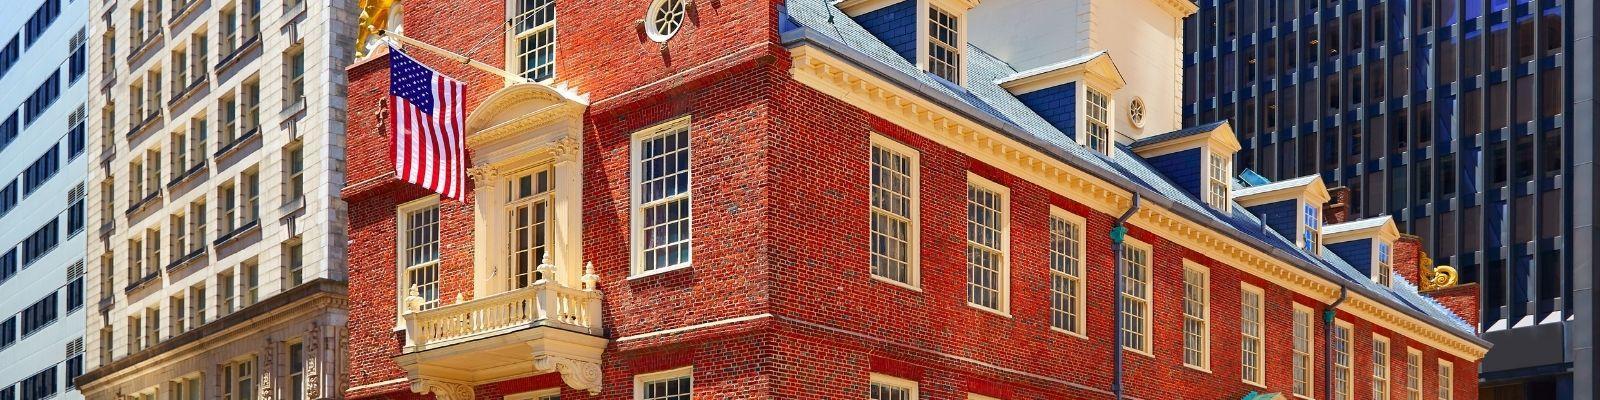 6 Must-See Boston Neighborhoods & How to Visit